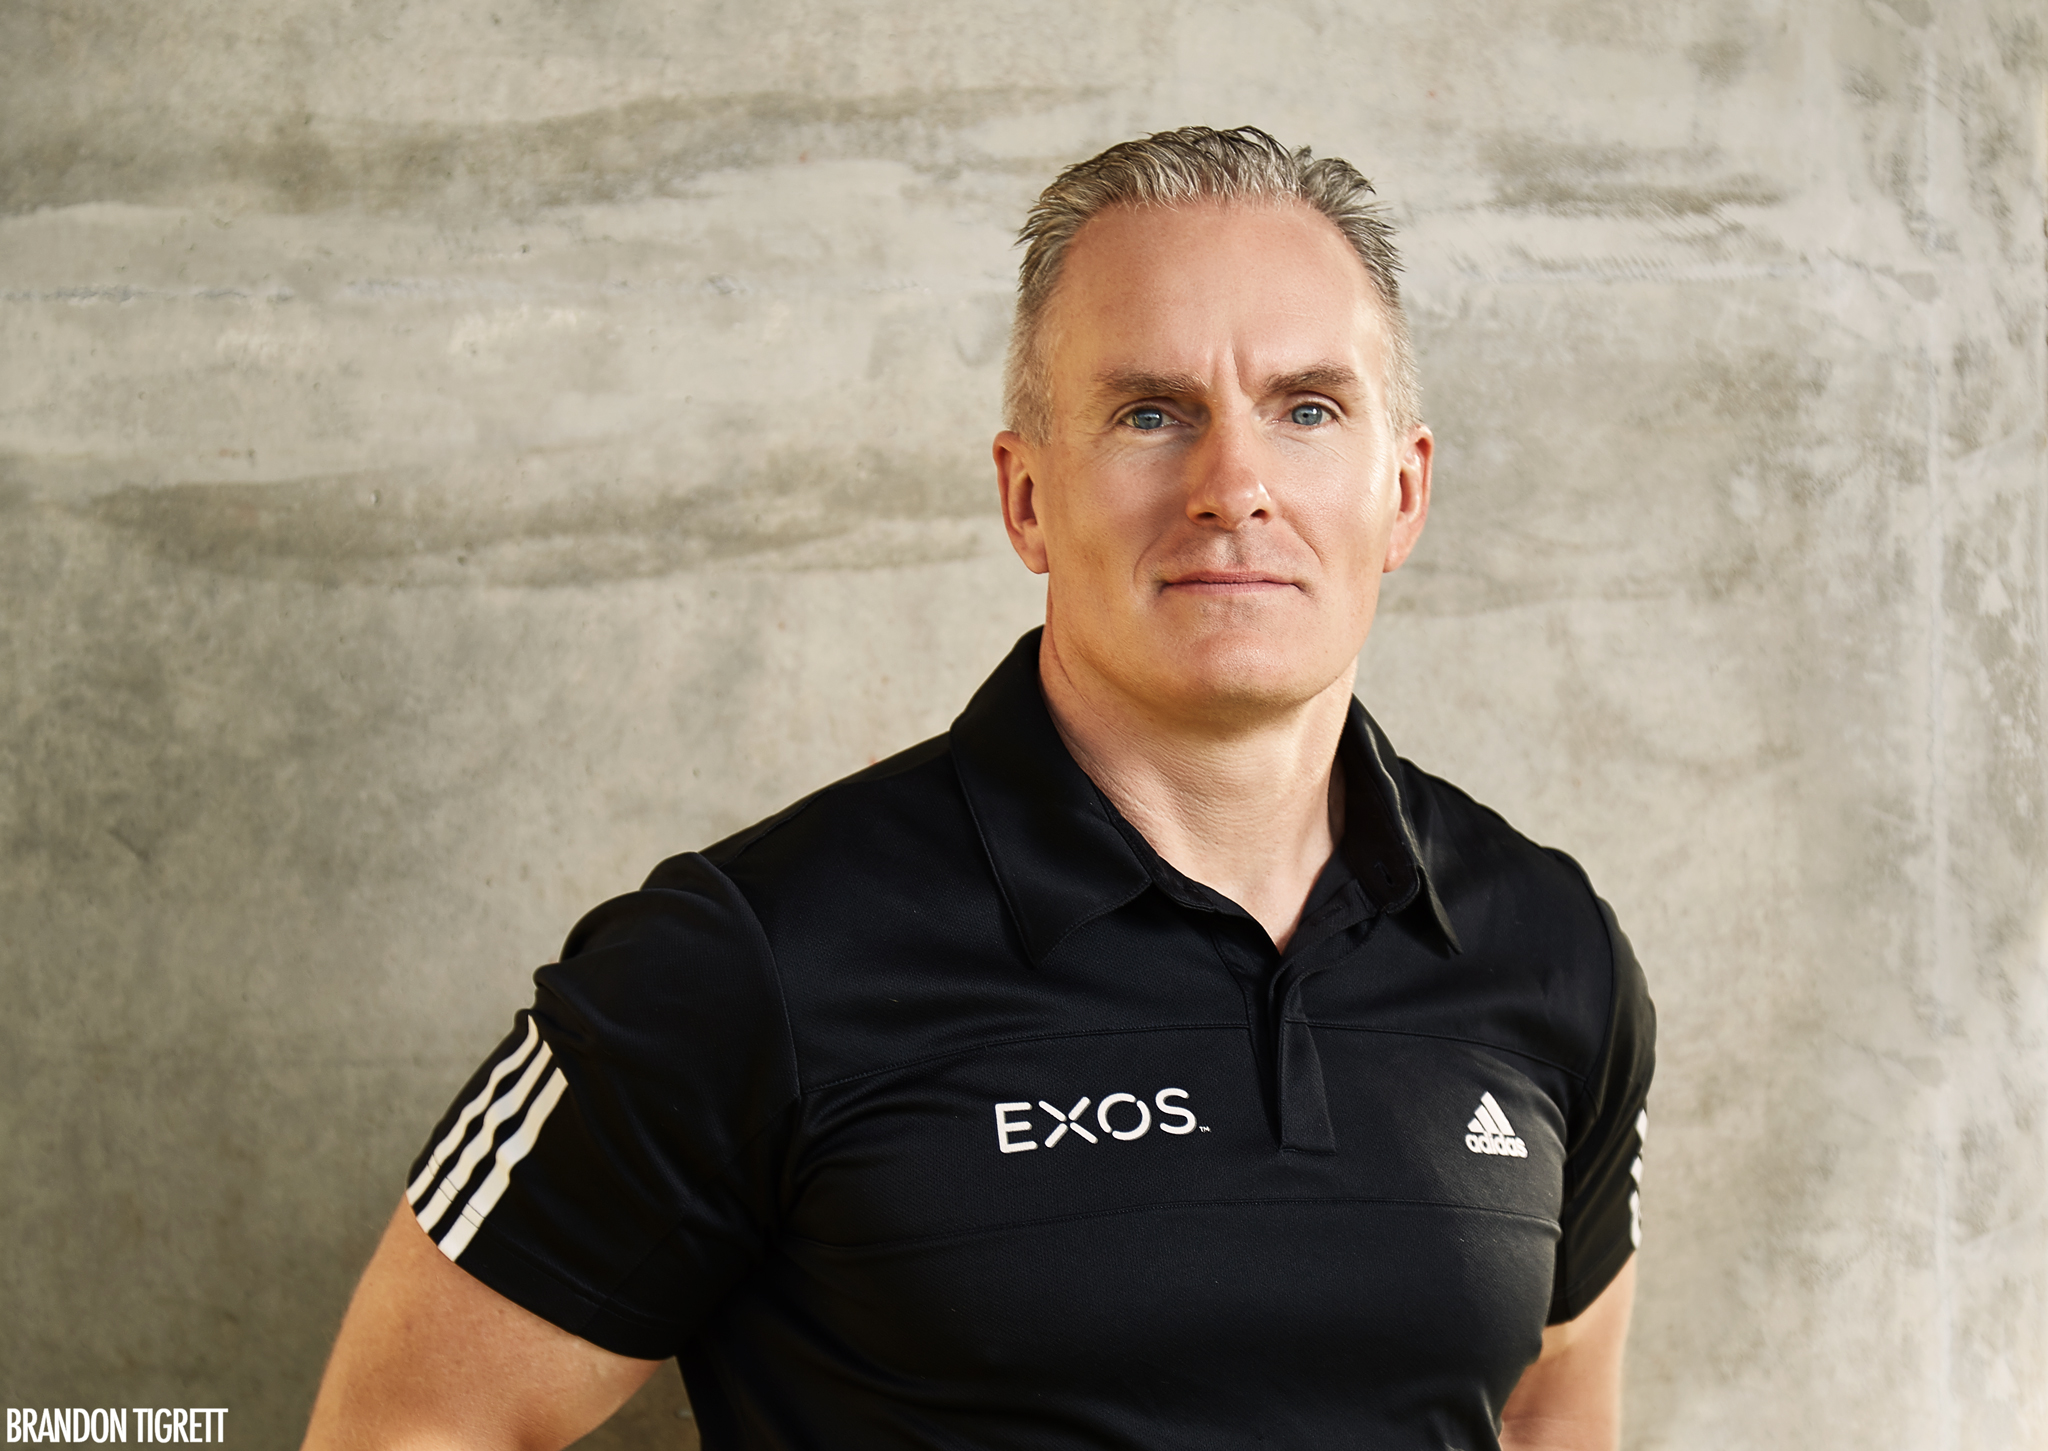 EXOS Athletes Performance - Mark Verstegen